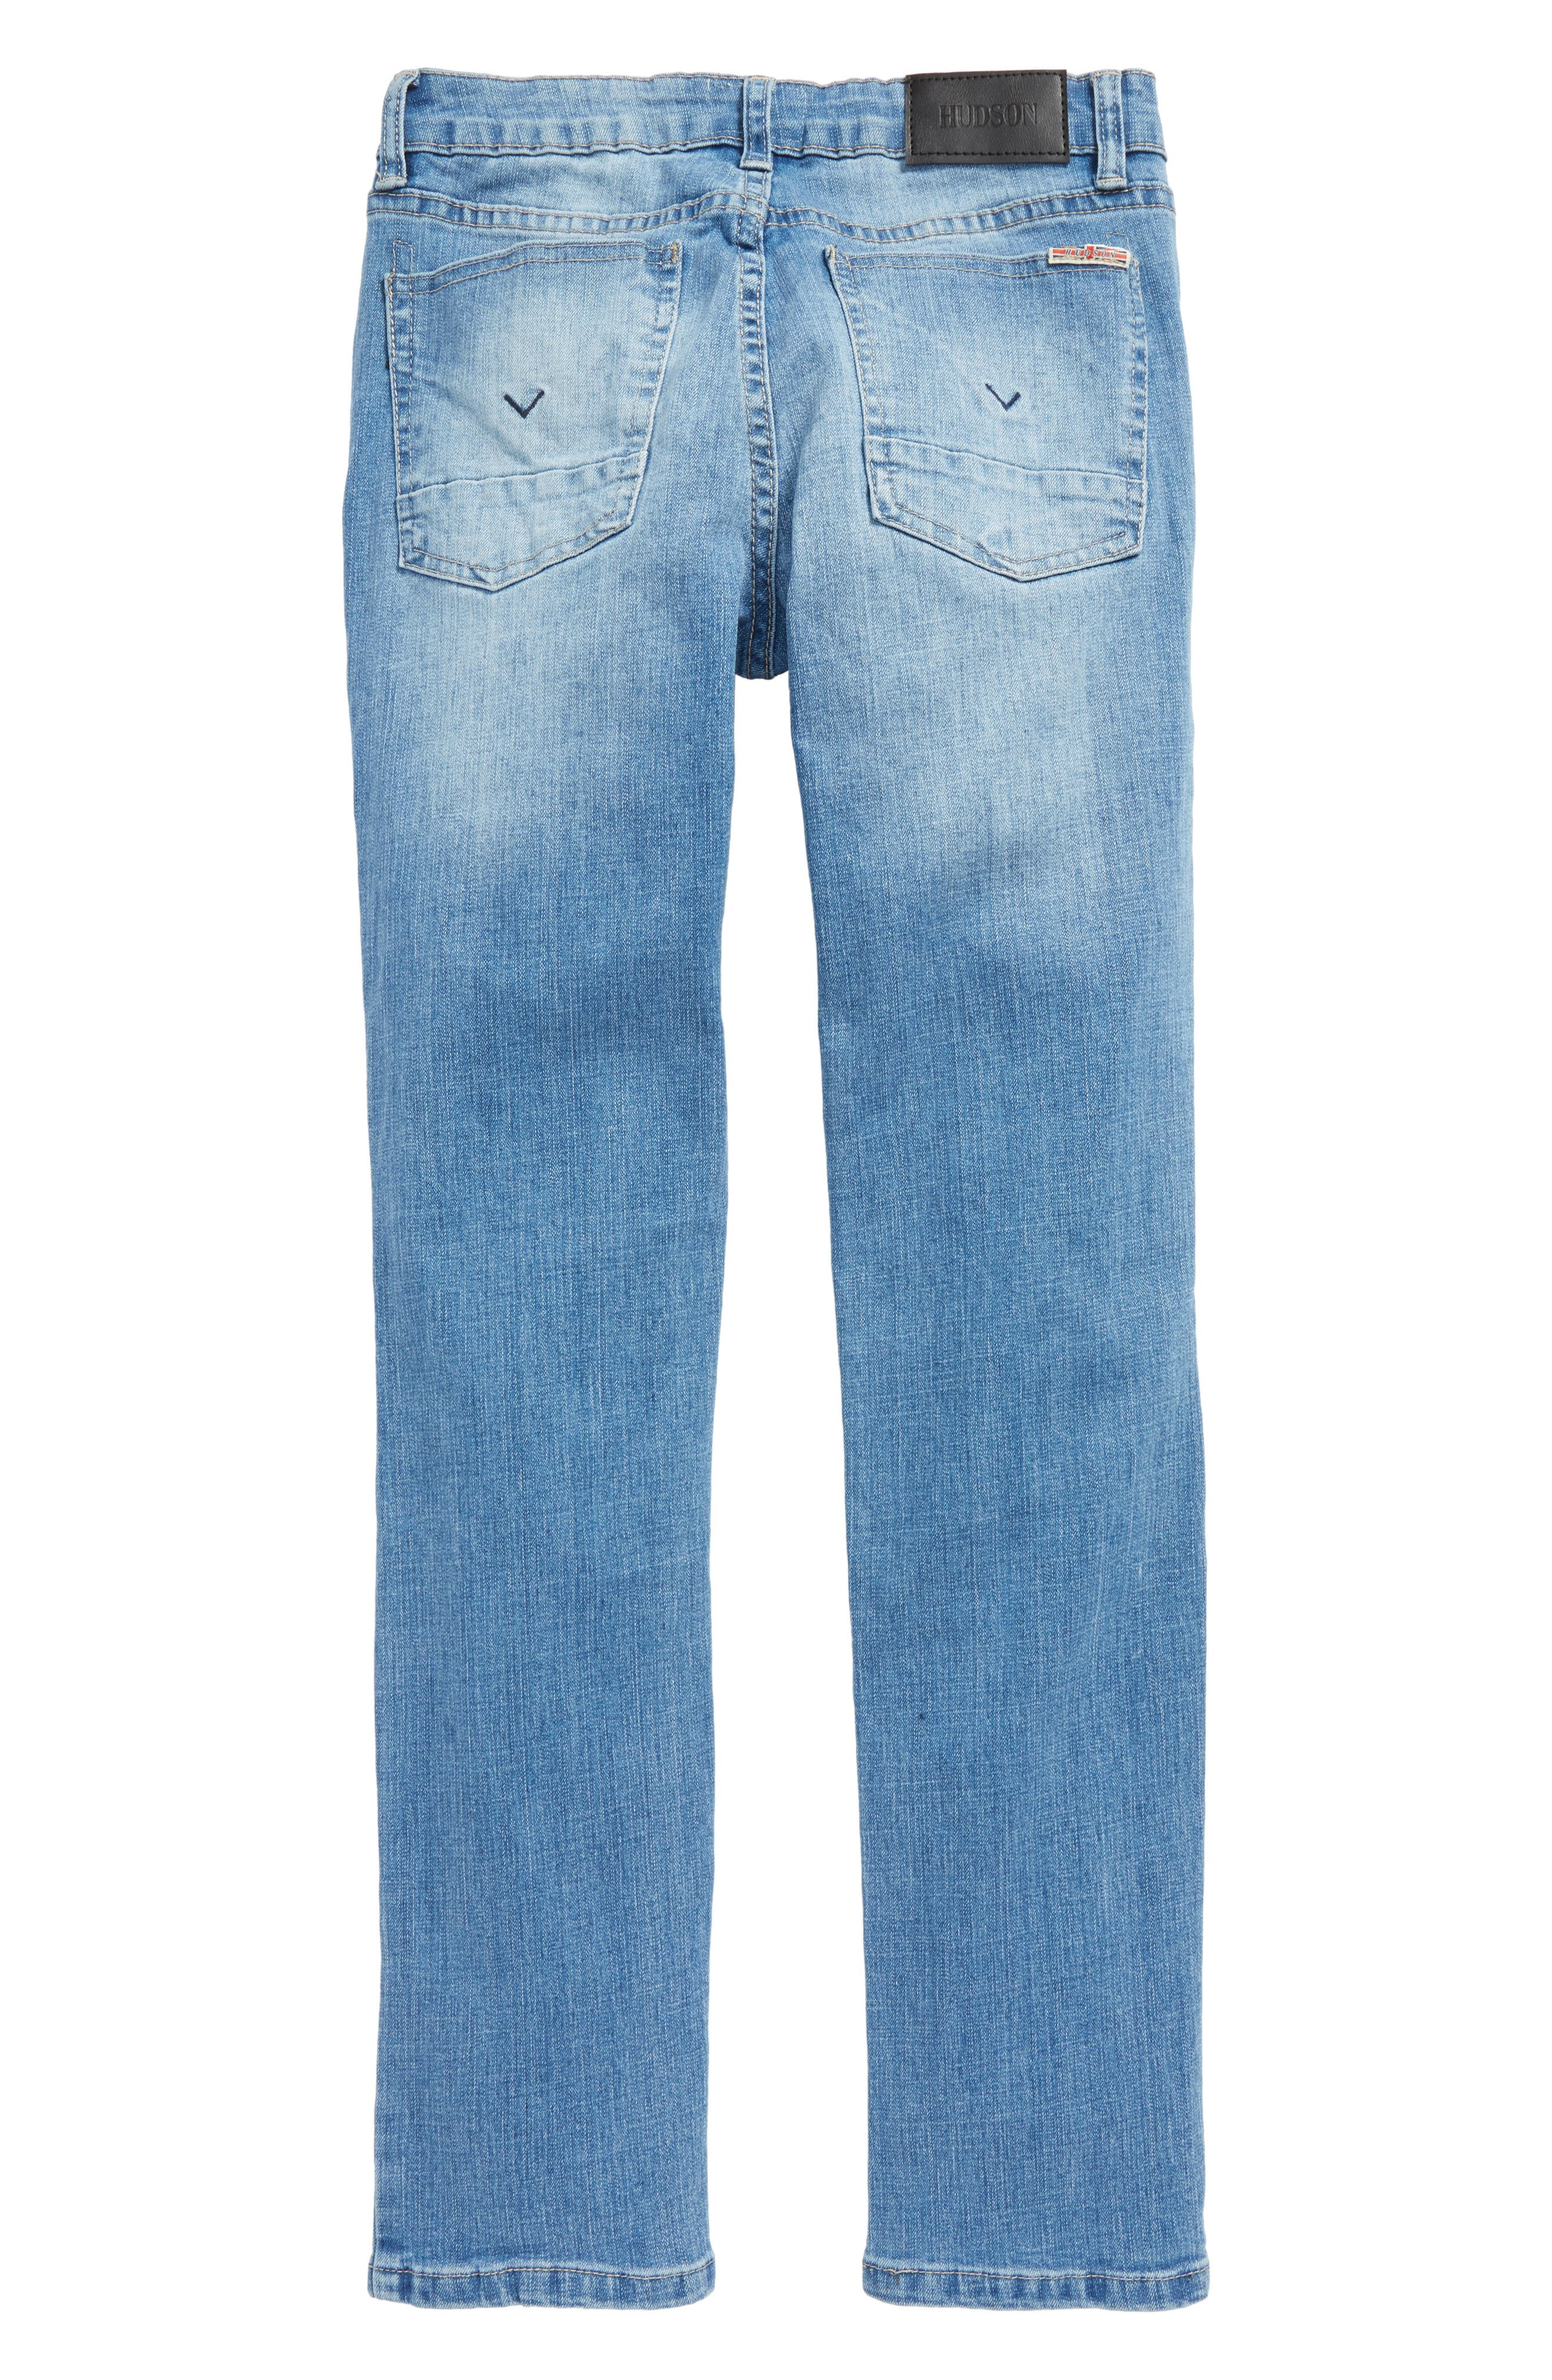 Jude Skinny Jeans,                             Alternate thumbnail 2, color,                             465